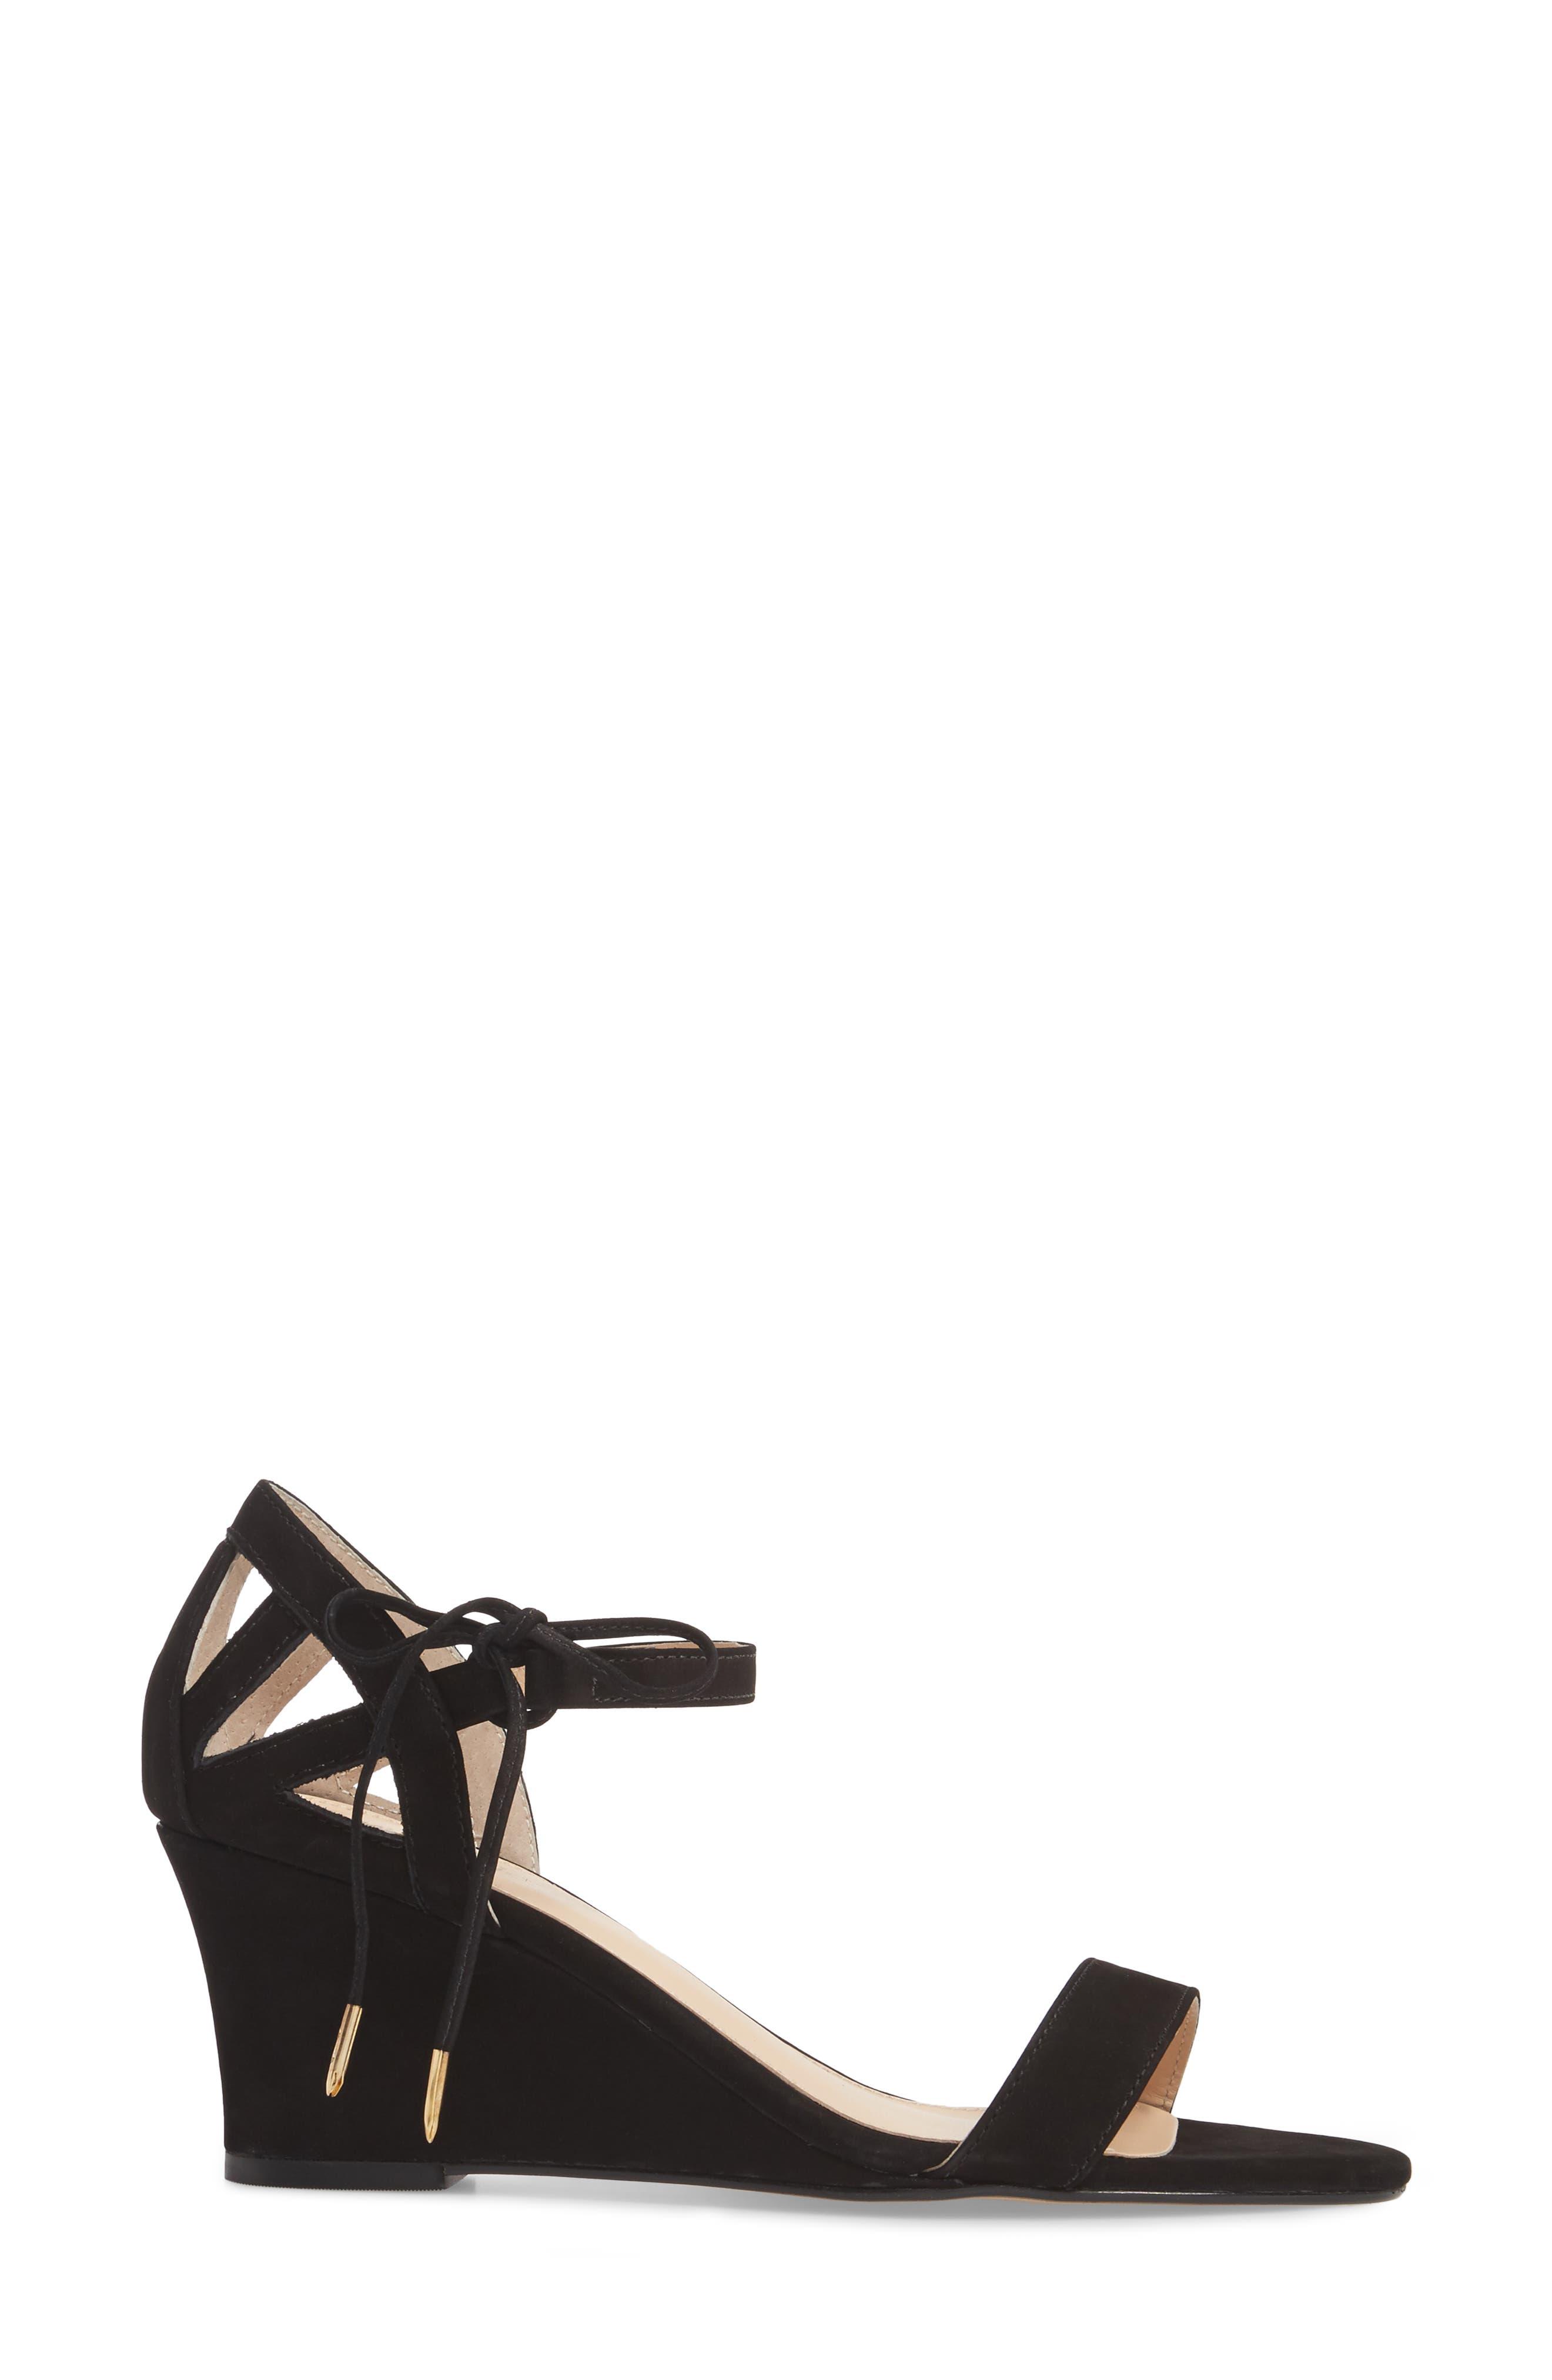 Kaeli Wedge Sandal,                             Alternate thumbnail 3, color,                             BLACK LEATHER